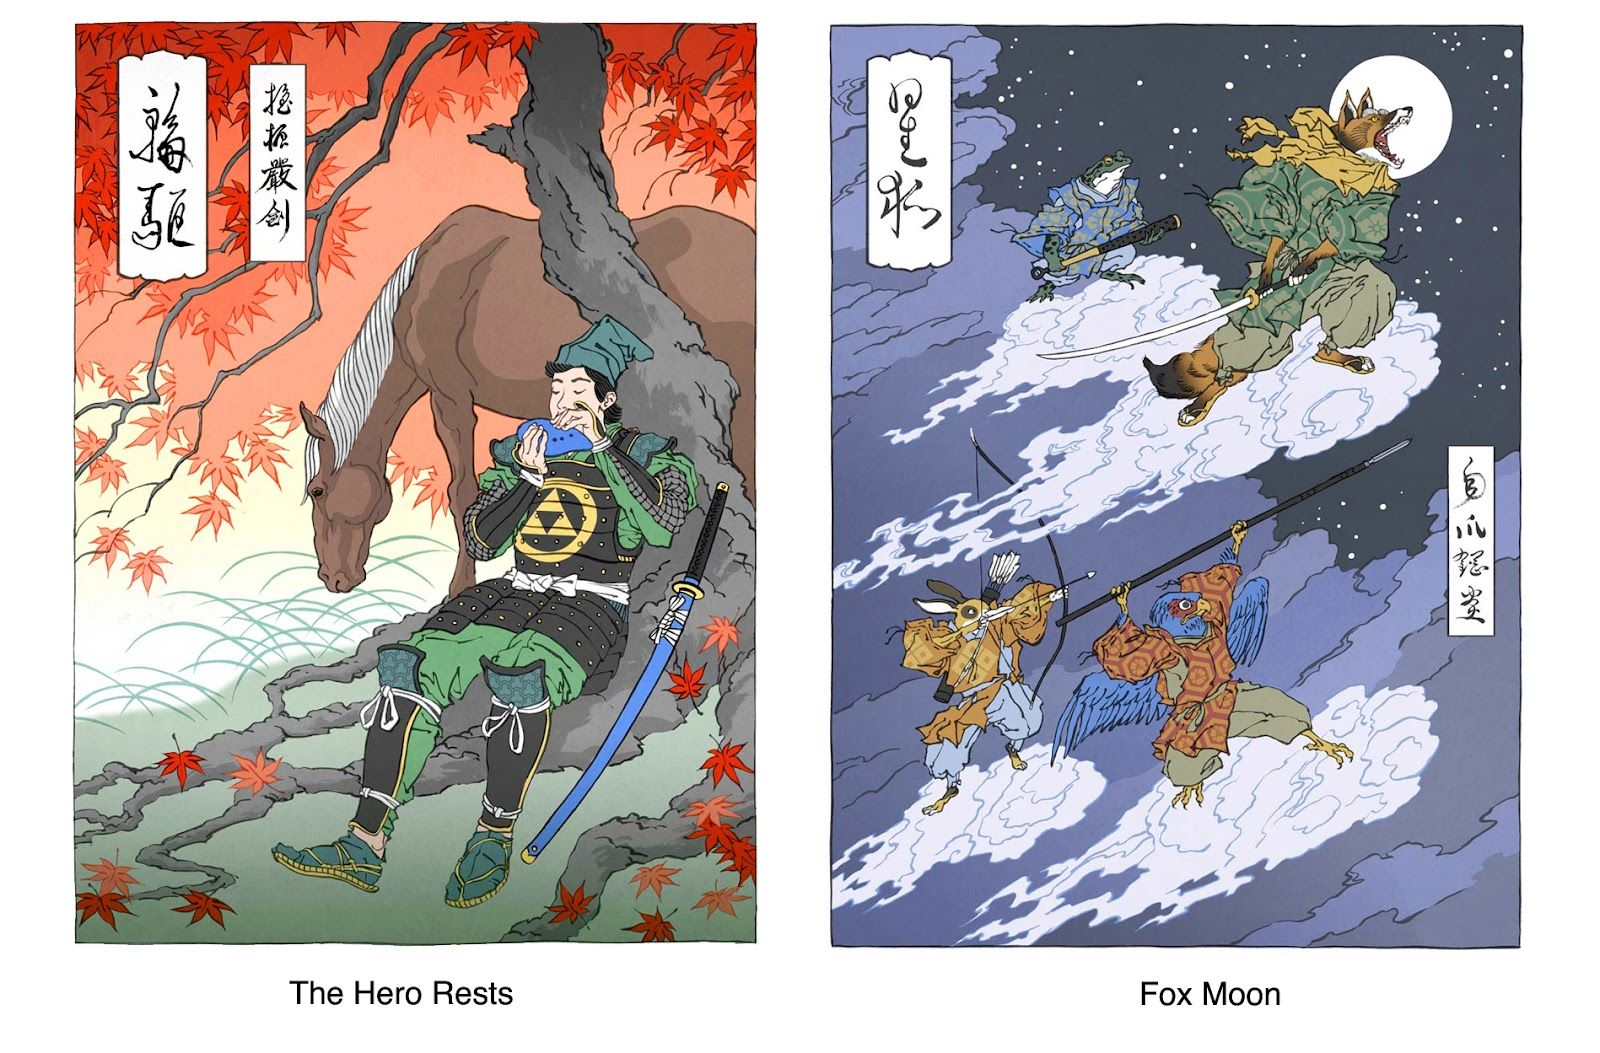 Jed Henry/David Bull - Ukiyo-e Heroes